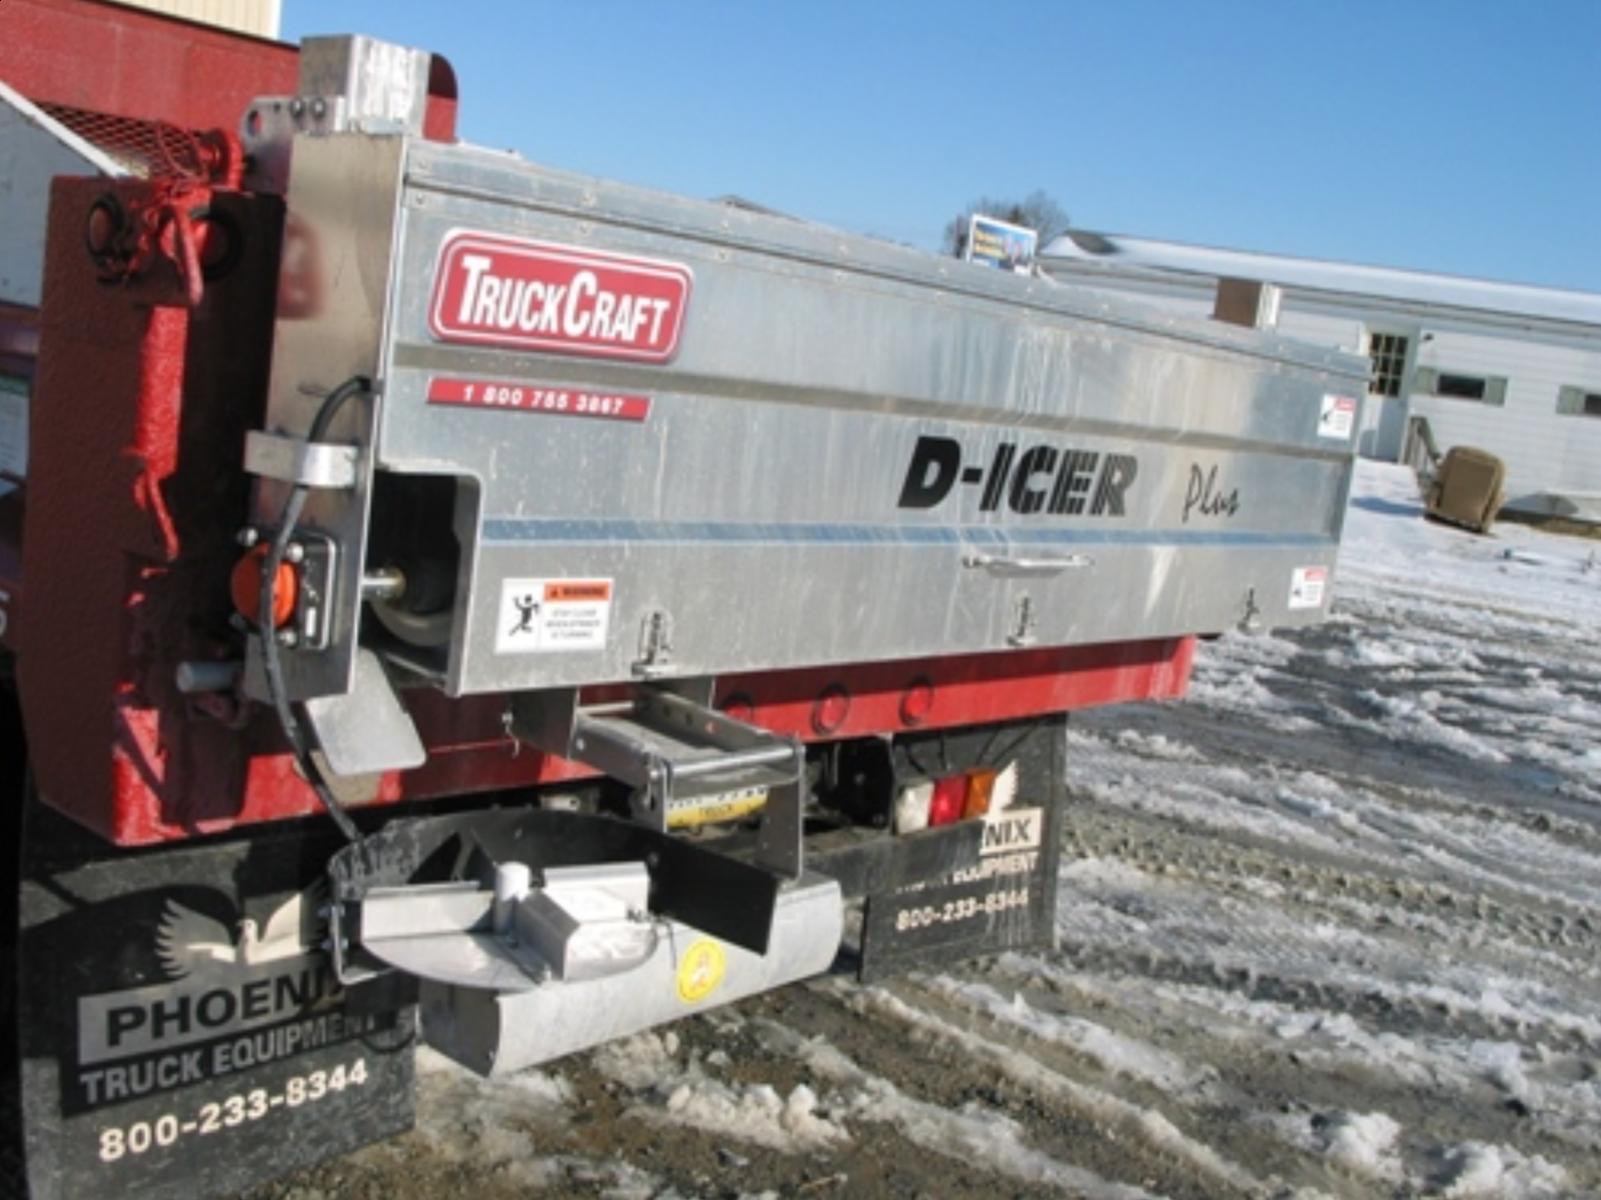 Truck Craft TC-140 PLUS D-ICER Salt Spreader D1-04431